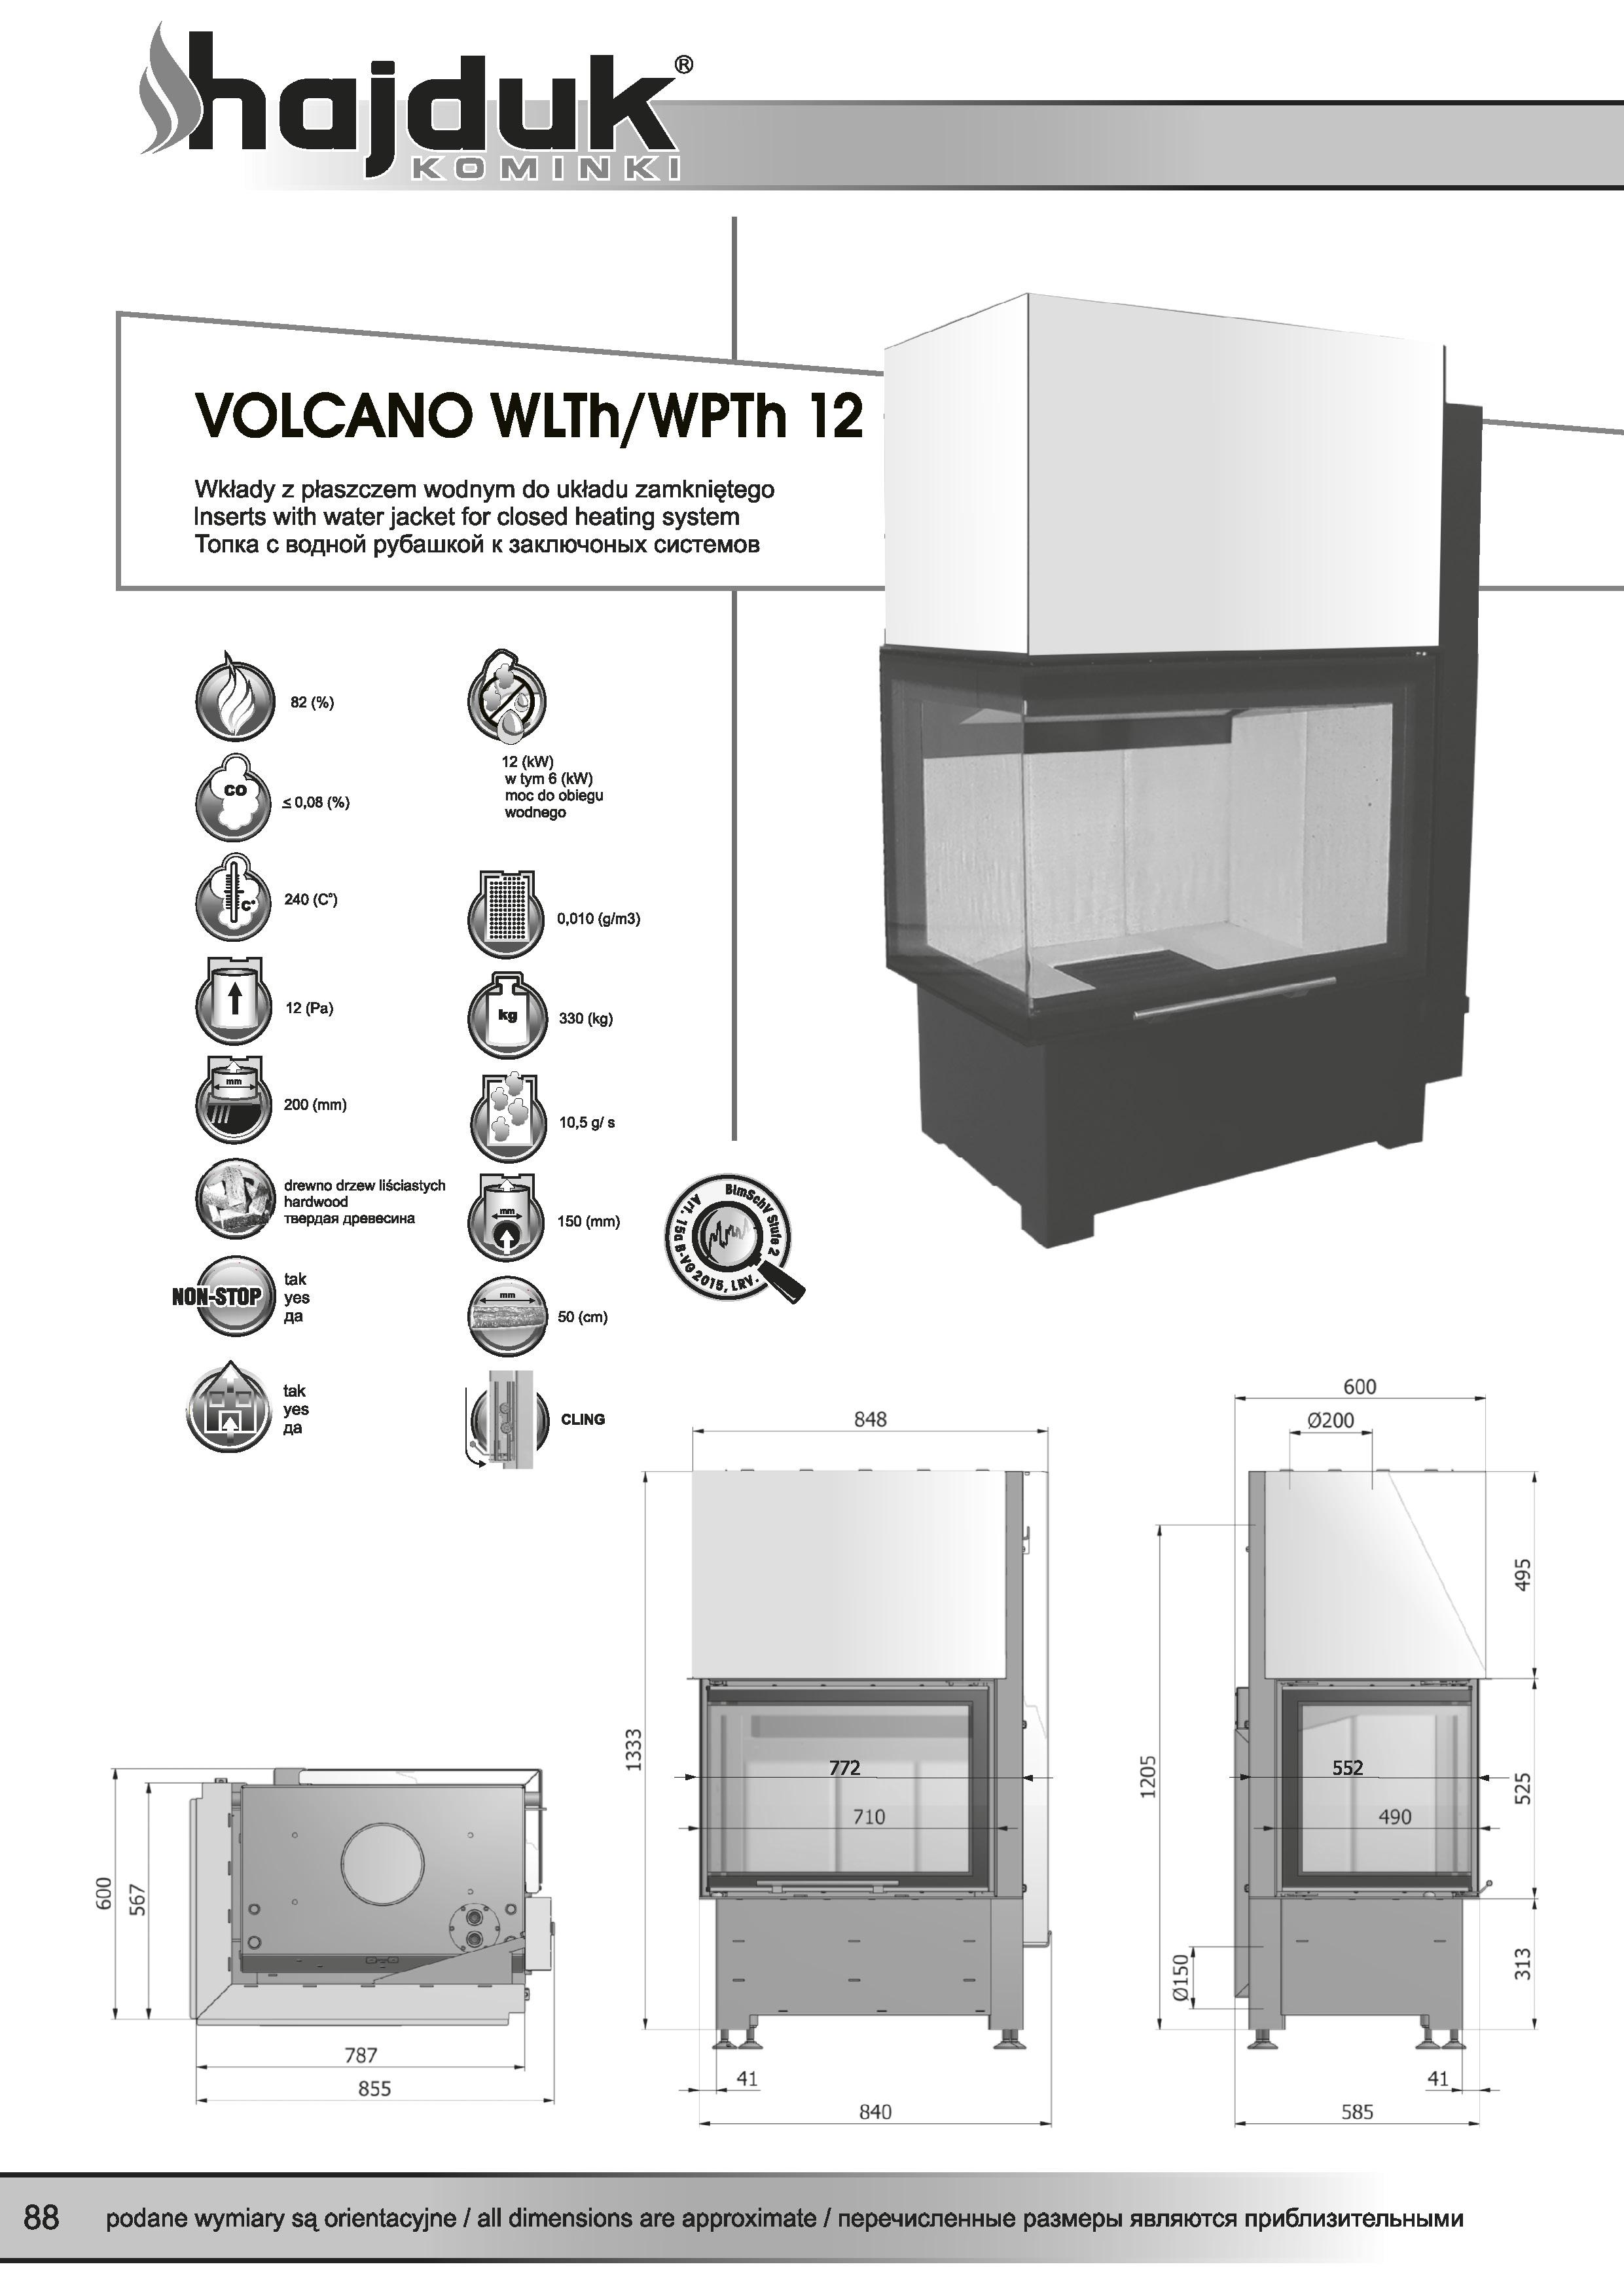 Volcano%20WLTh%20WPTh%20 %2012%20 %20karta%20techniczna - Hajduk  Volcano WPTh 12